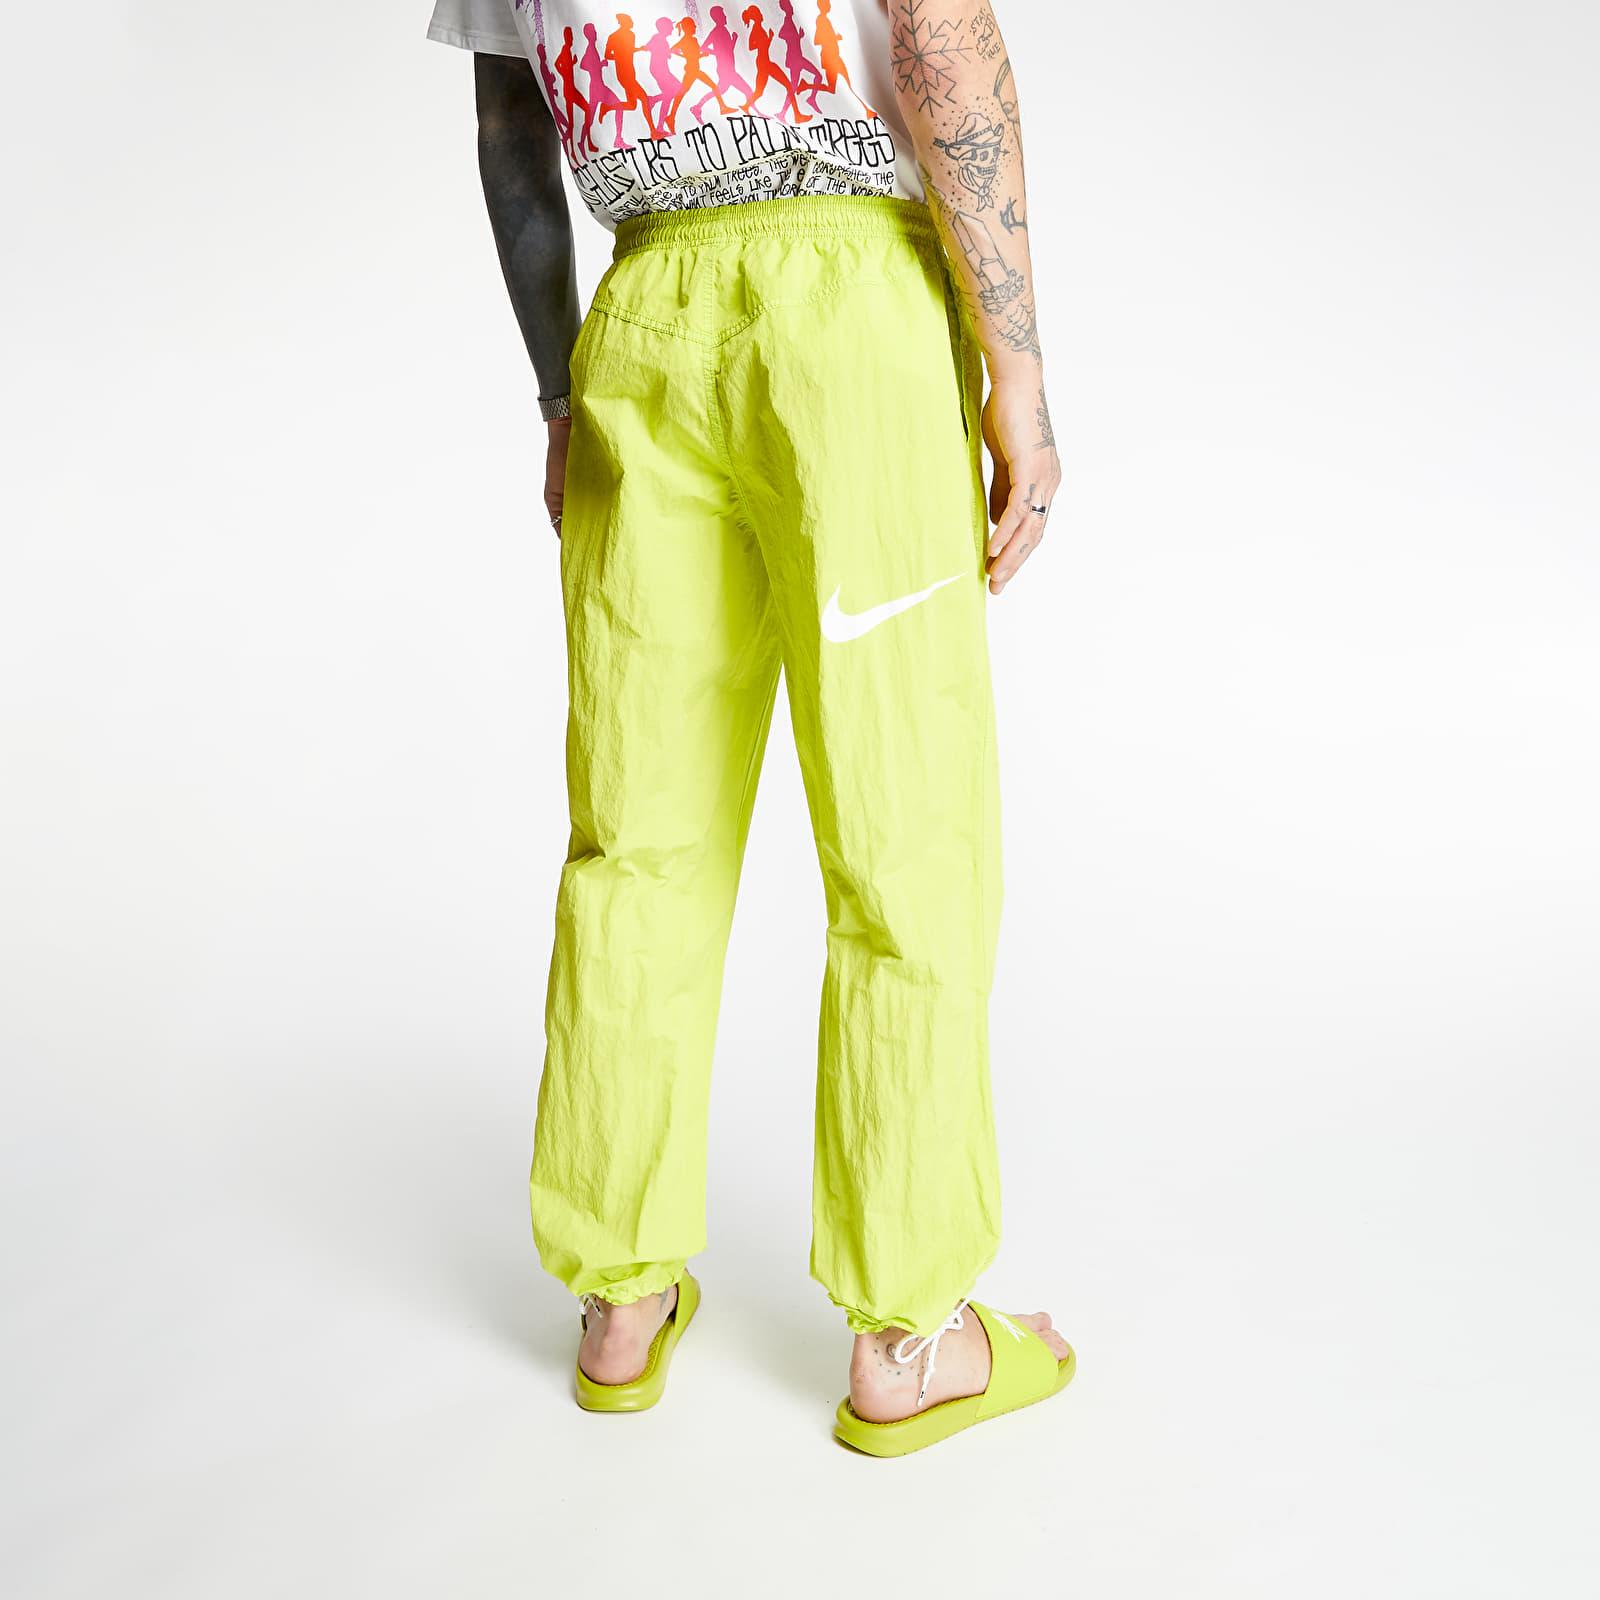 NikeLab x Stüssy Beach Pants Bright Cactus, Green